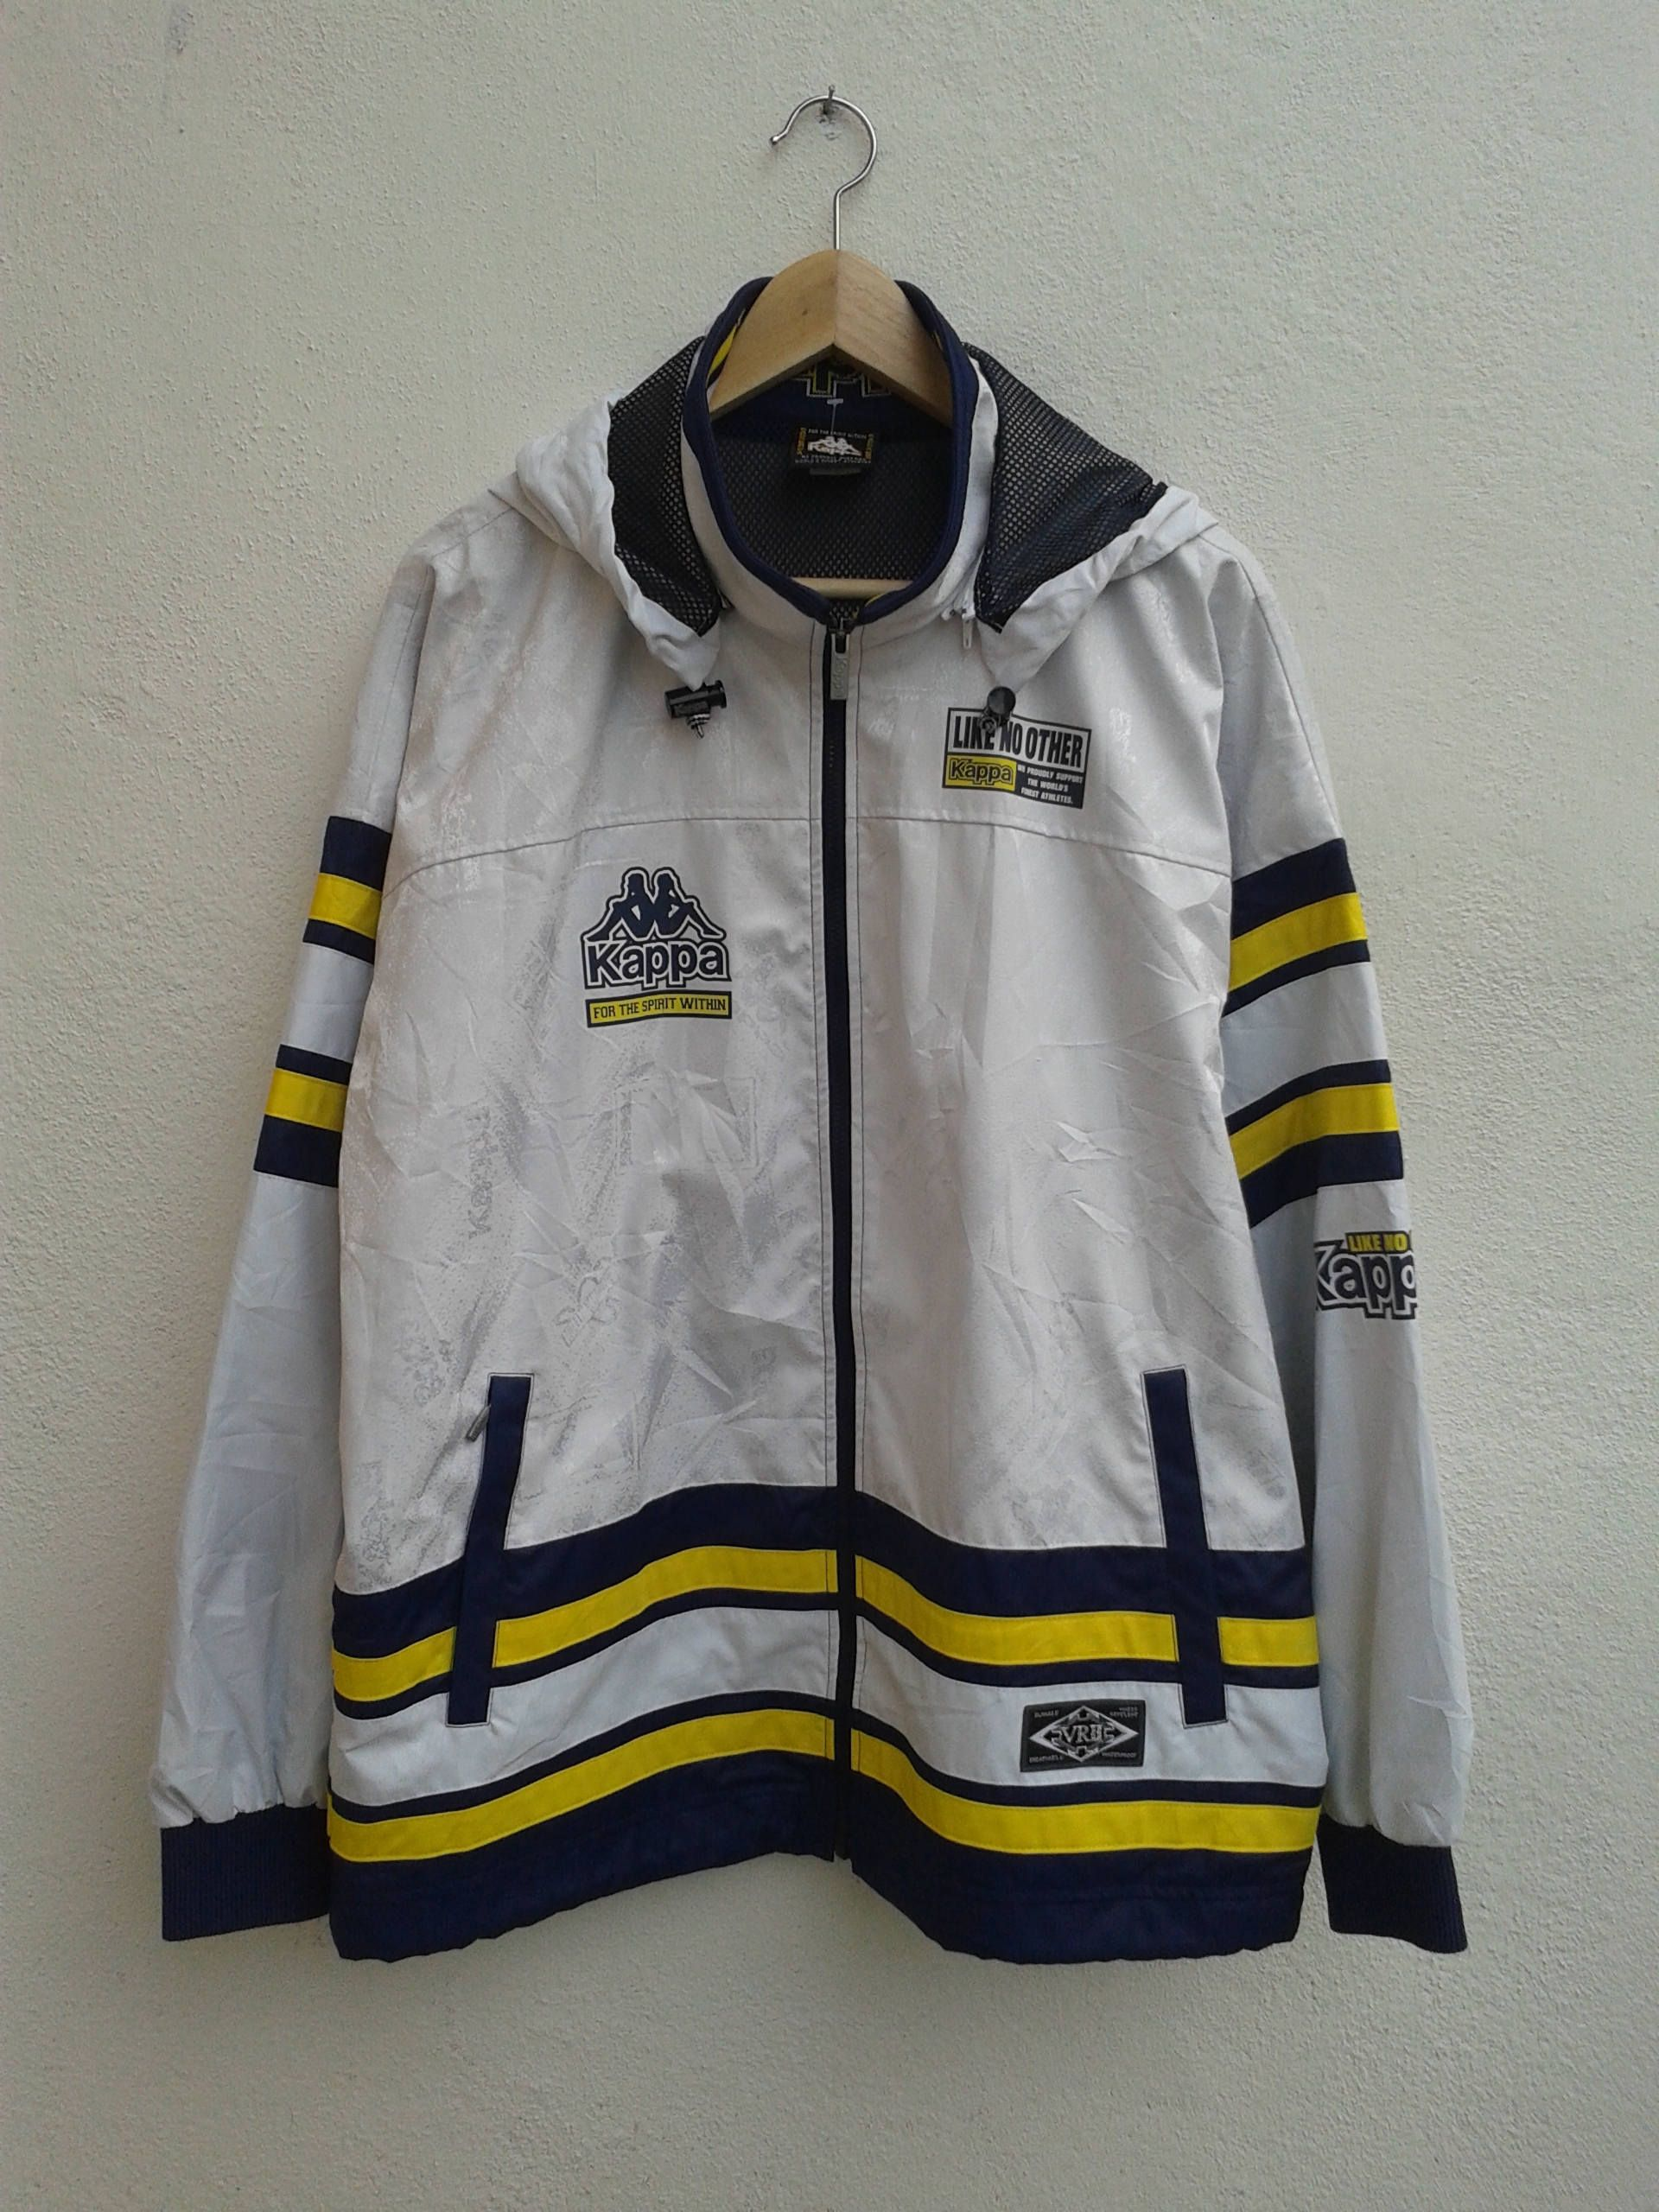 3b99b43af Vintage 90s KAPPA Giant Logo Color Cross Stripes Running Windbreaker  Streetwear Style Hoodies Jacket Size O by BubaGumpBudu on Etsy